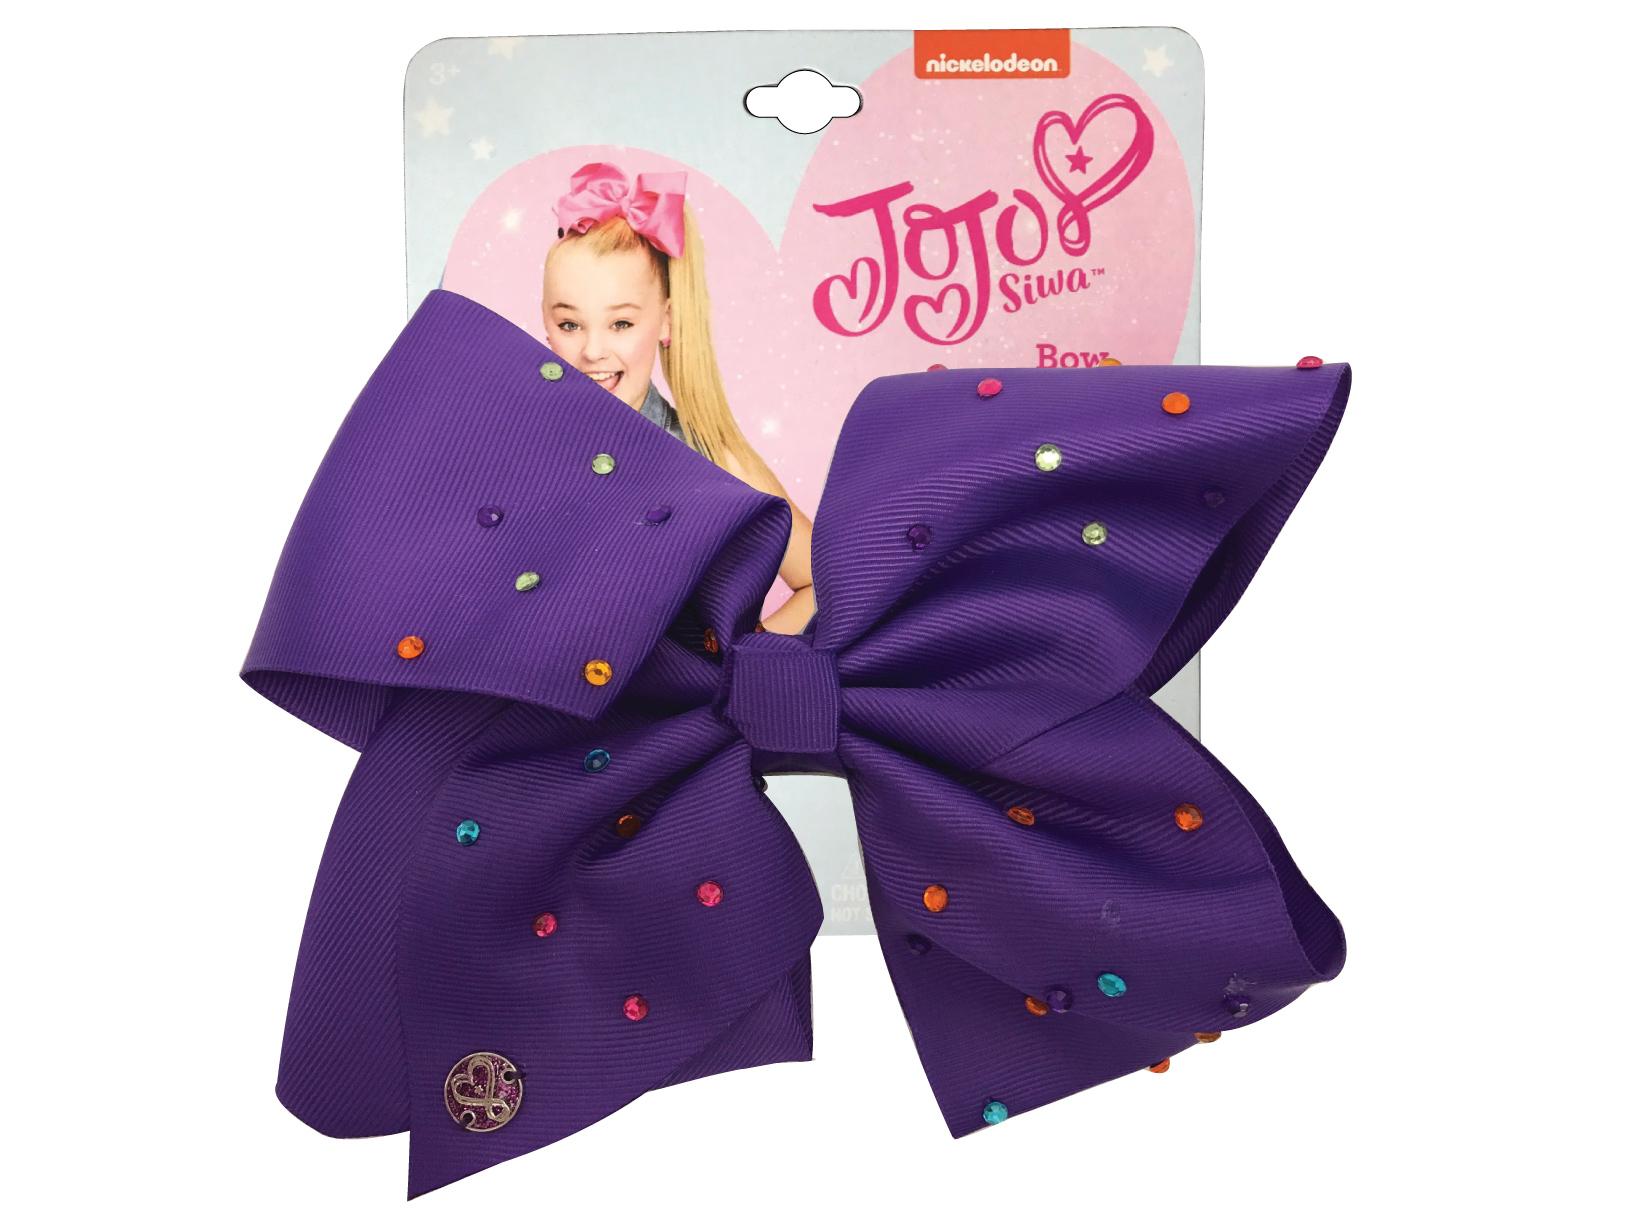 JoJo Siwa Large Cheer Hair Bow (Purple w/Colored Rhinestones)